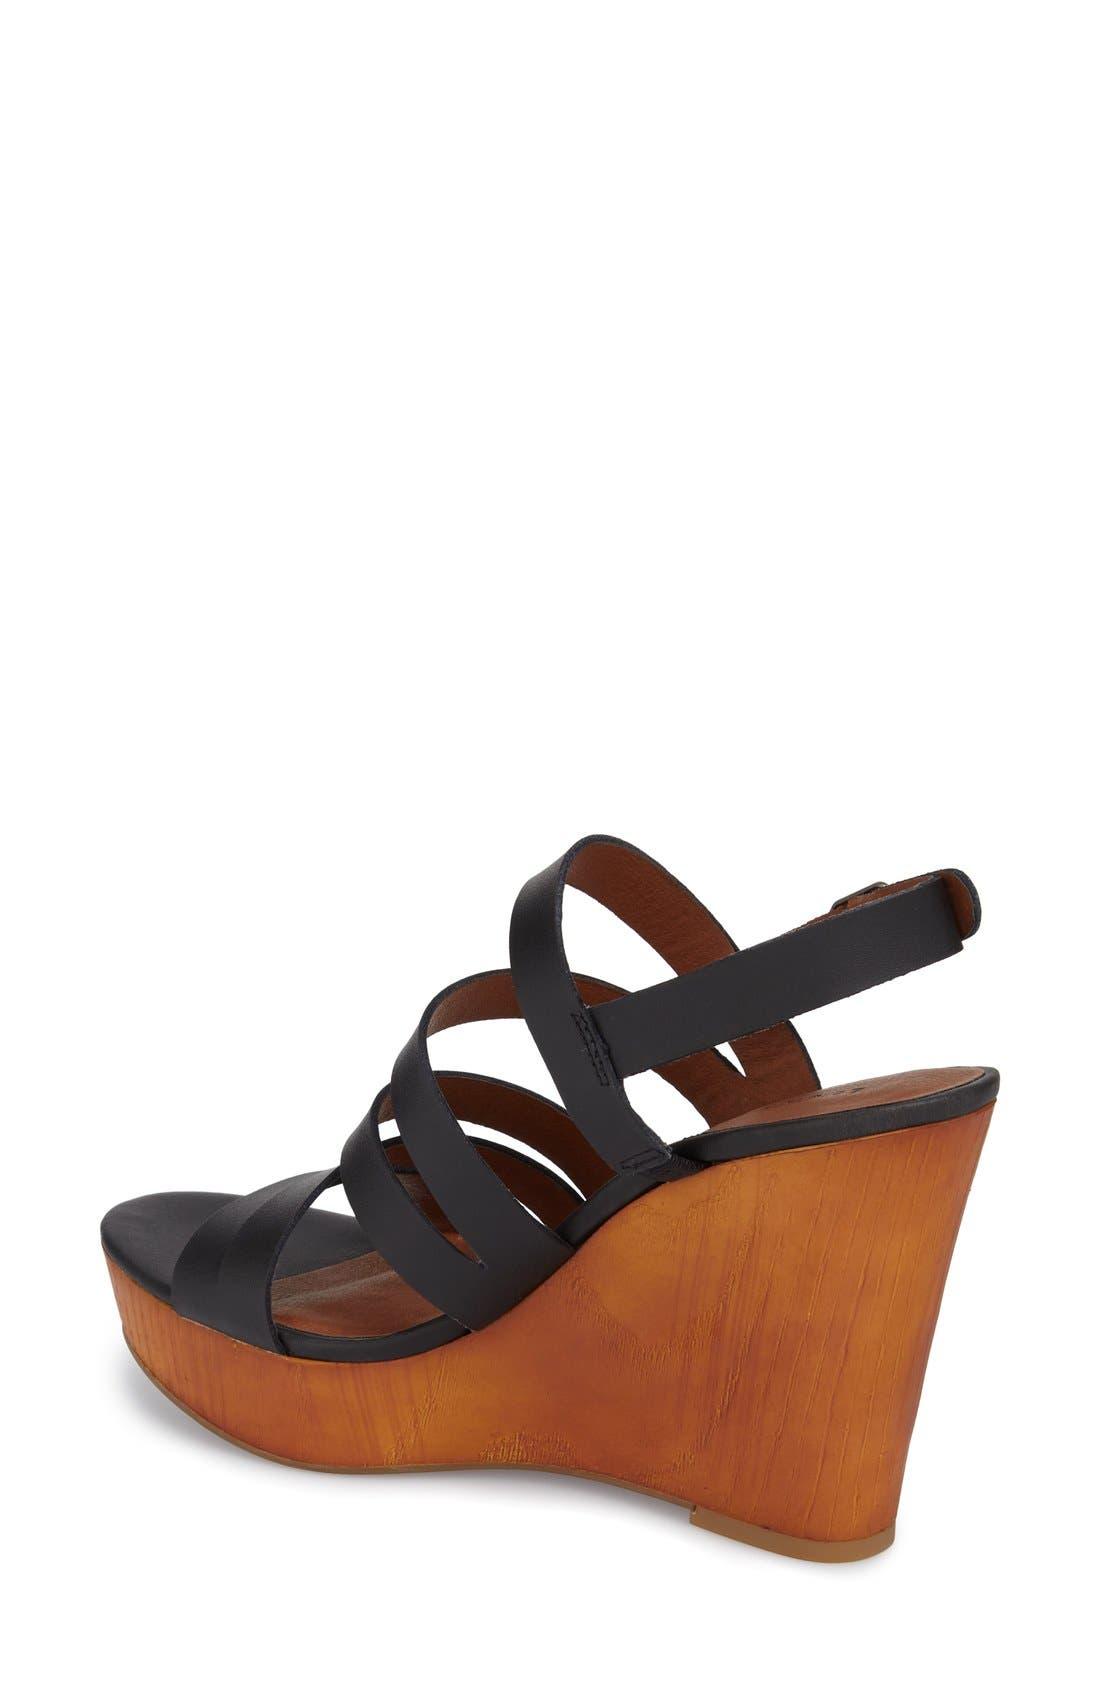 Alternate Image 2  - Lucky Brand 'Larinaa' Wedge Sandal (Women)